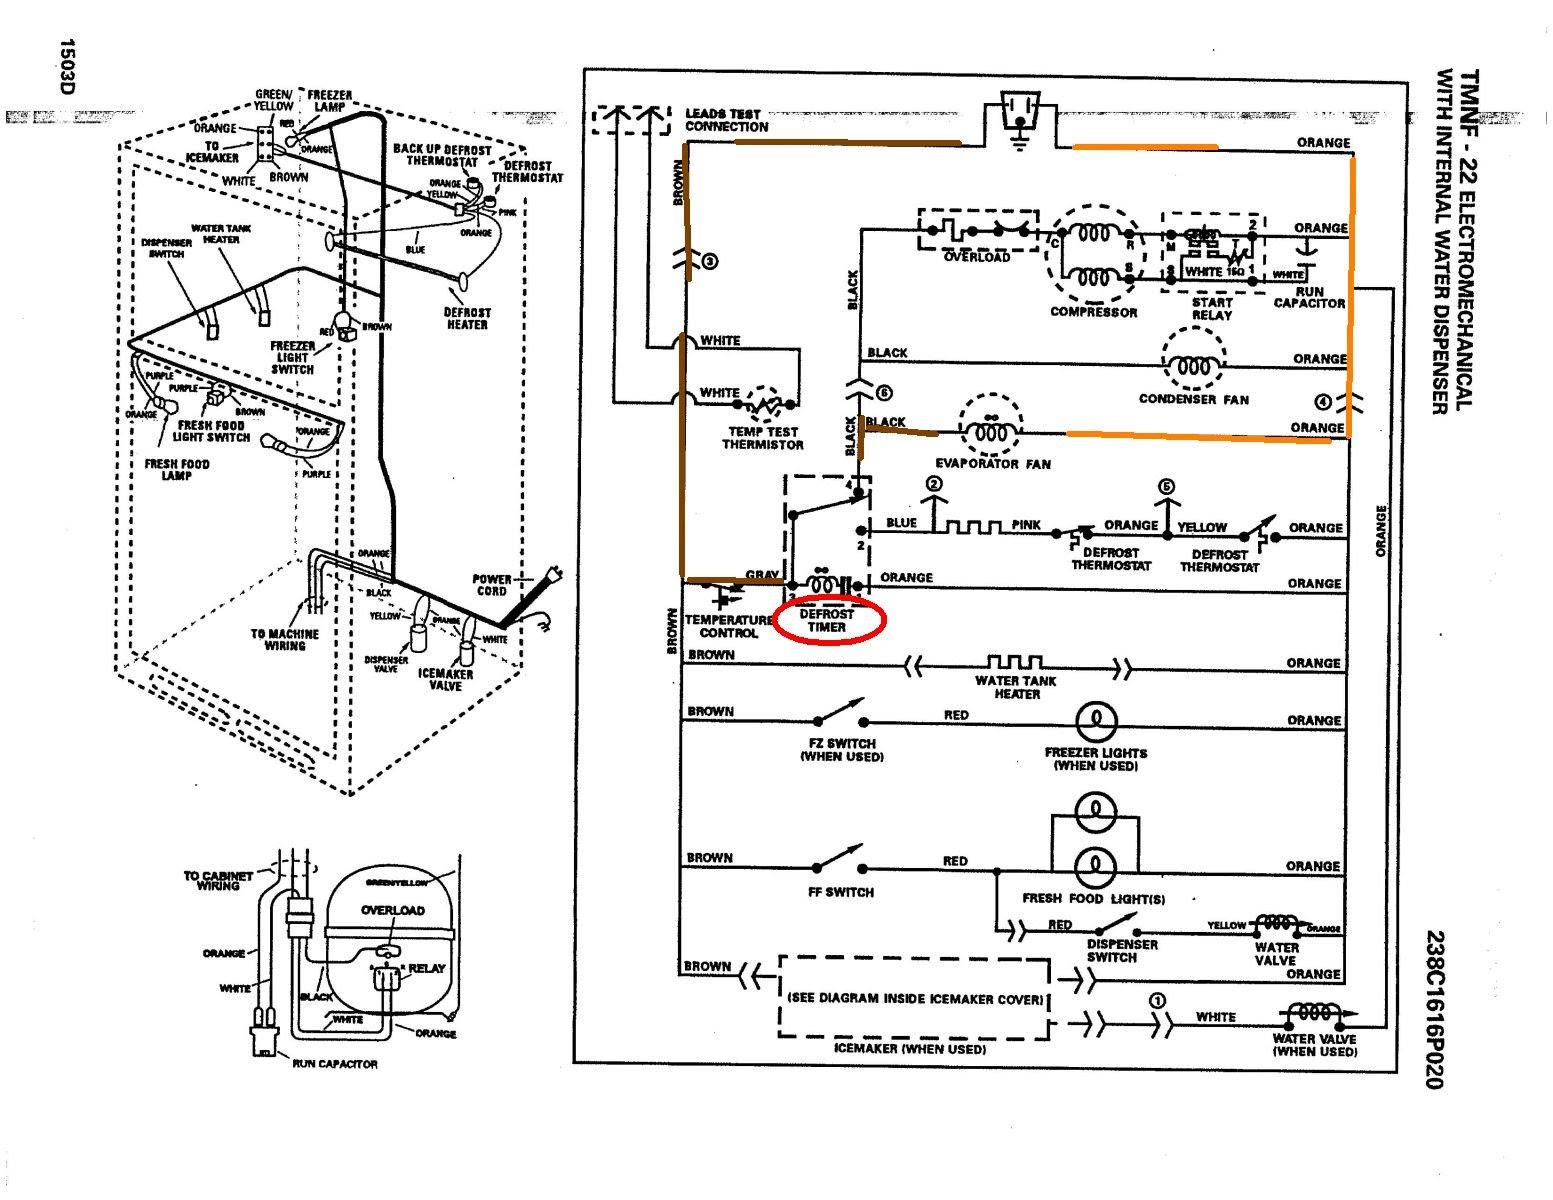 Wiring Diagram Ge Refrigerator - Home Wiring Diagram | Ge Refrigerator Water Dispenser Wiring Diagram |  | Home Wiring Diagram